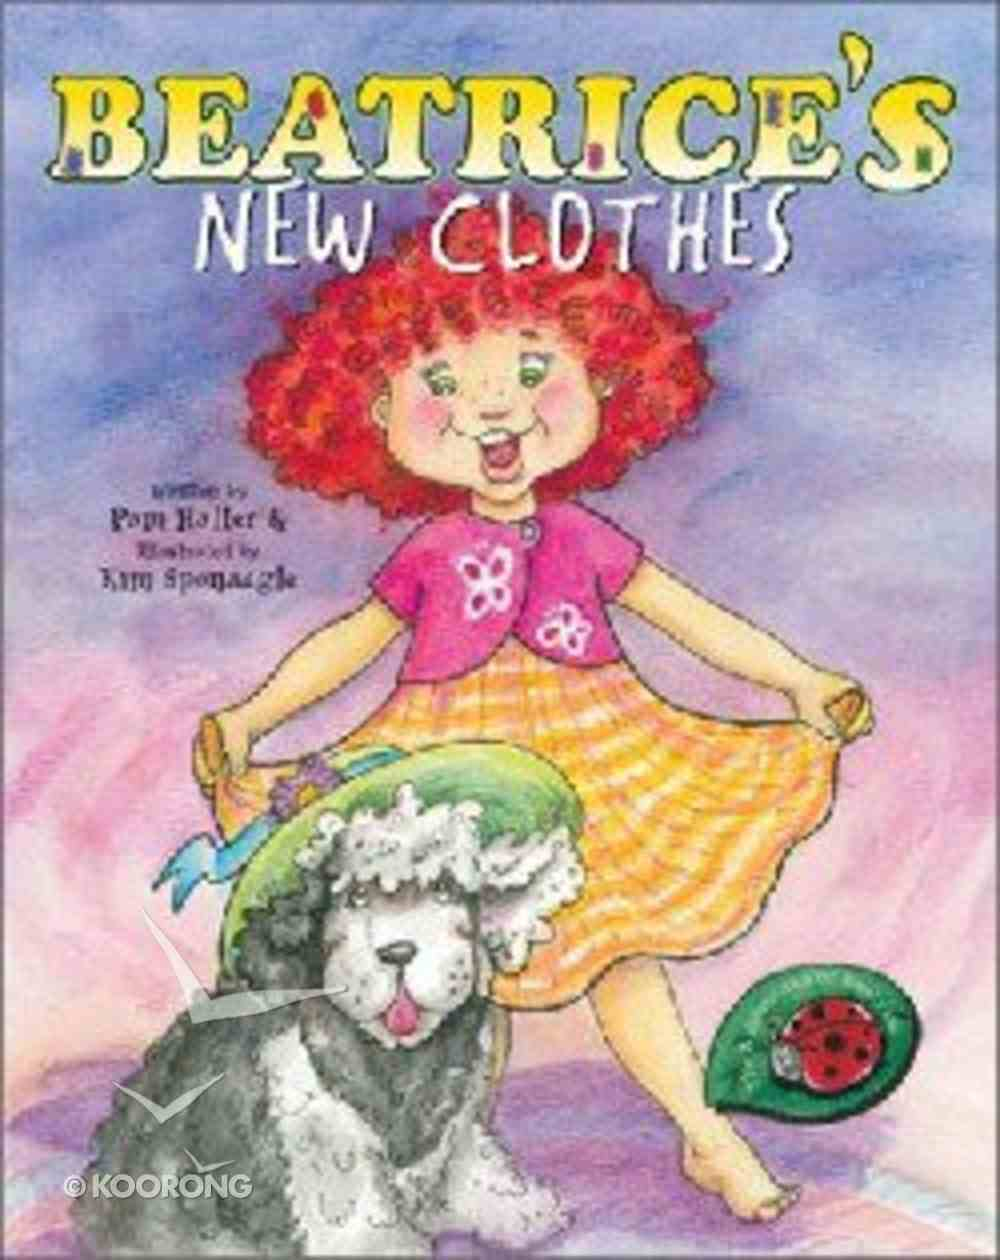 Beatrice's New Clothes (The Adventures Of Beatrice Series) Hardback